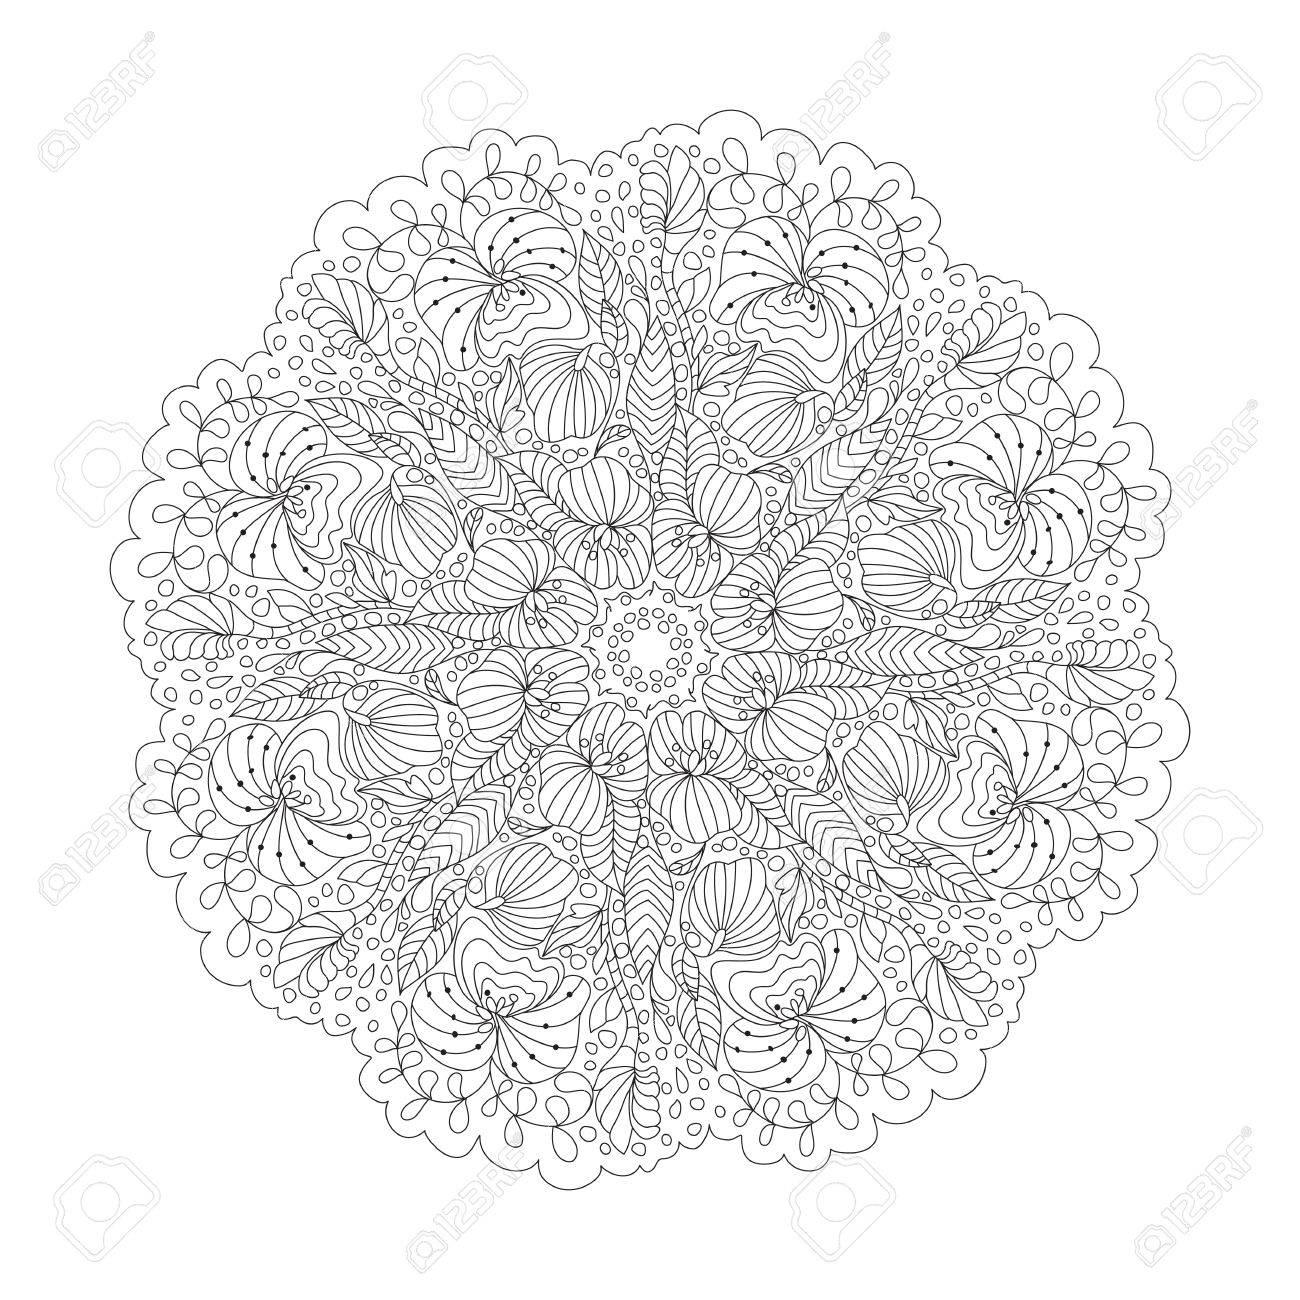 Esquema De Mandala Para Colorear. Ronda Adorno Decorativo. Anti ...